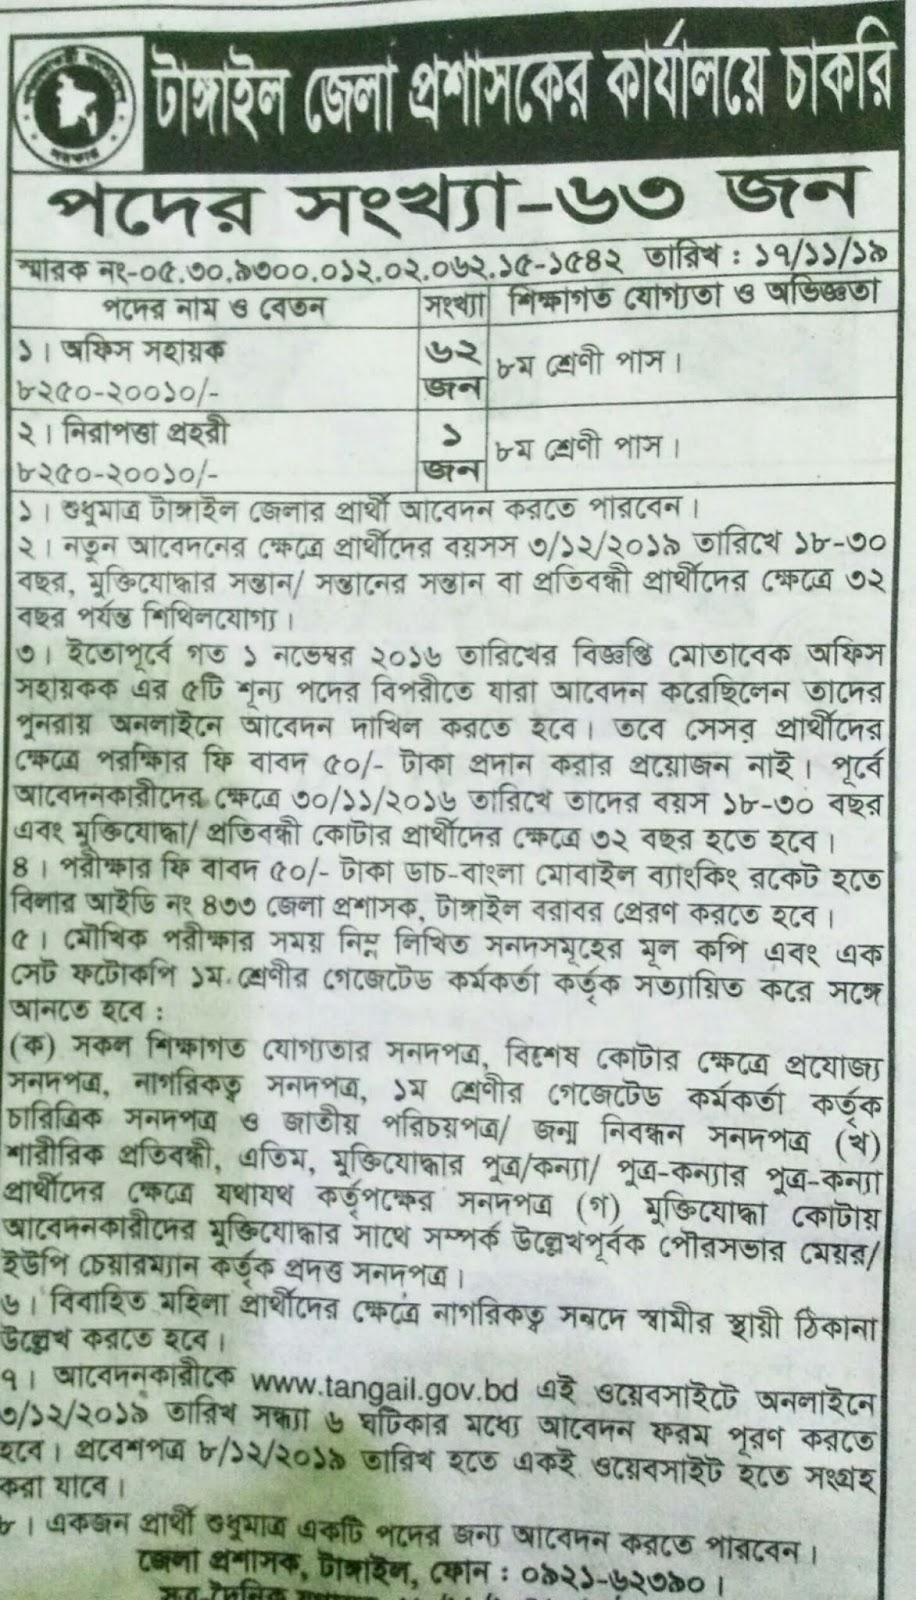 Tangail Deputy Commissioner's Office of the job 2019. টাঙ্গাইল জেলা প্রশাসকের কার্যলয় নিয়োগ বিজ্ঞপ্তি ২০১৯